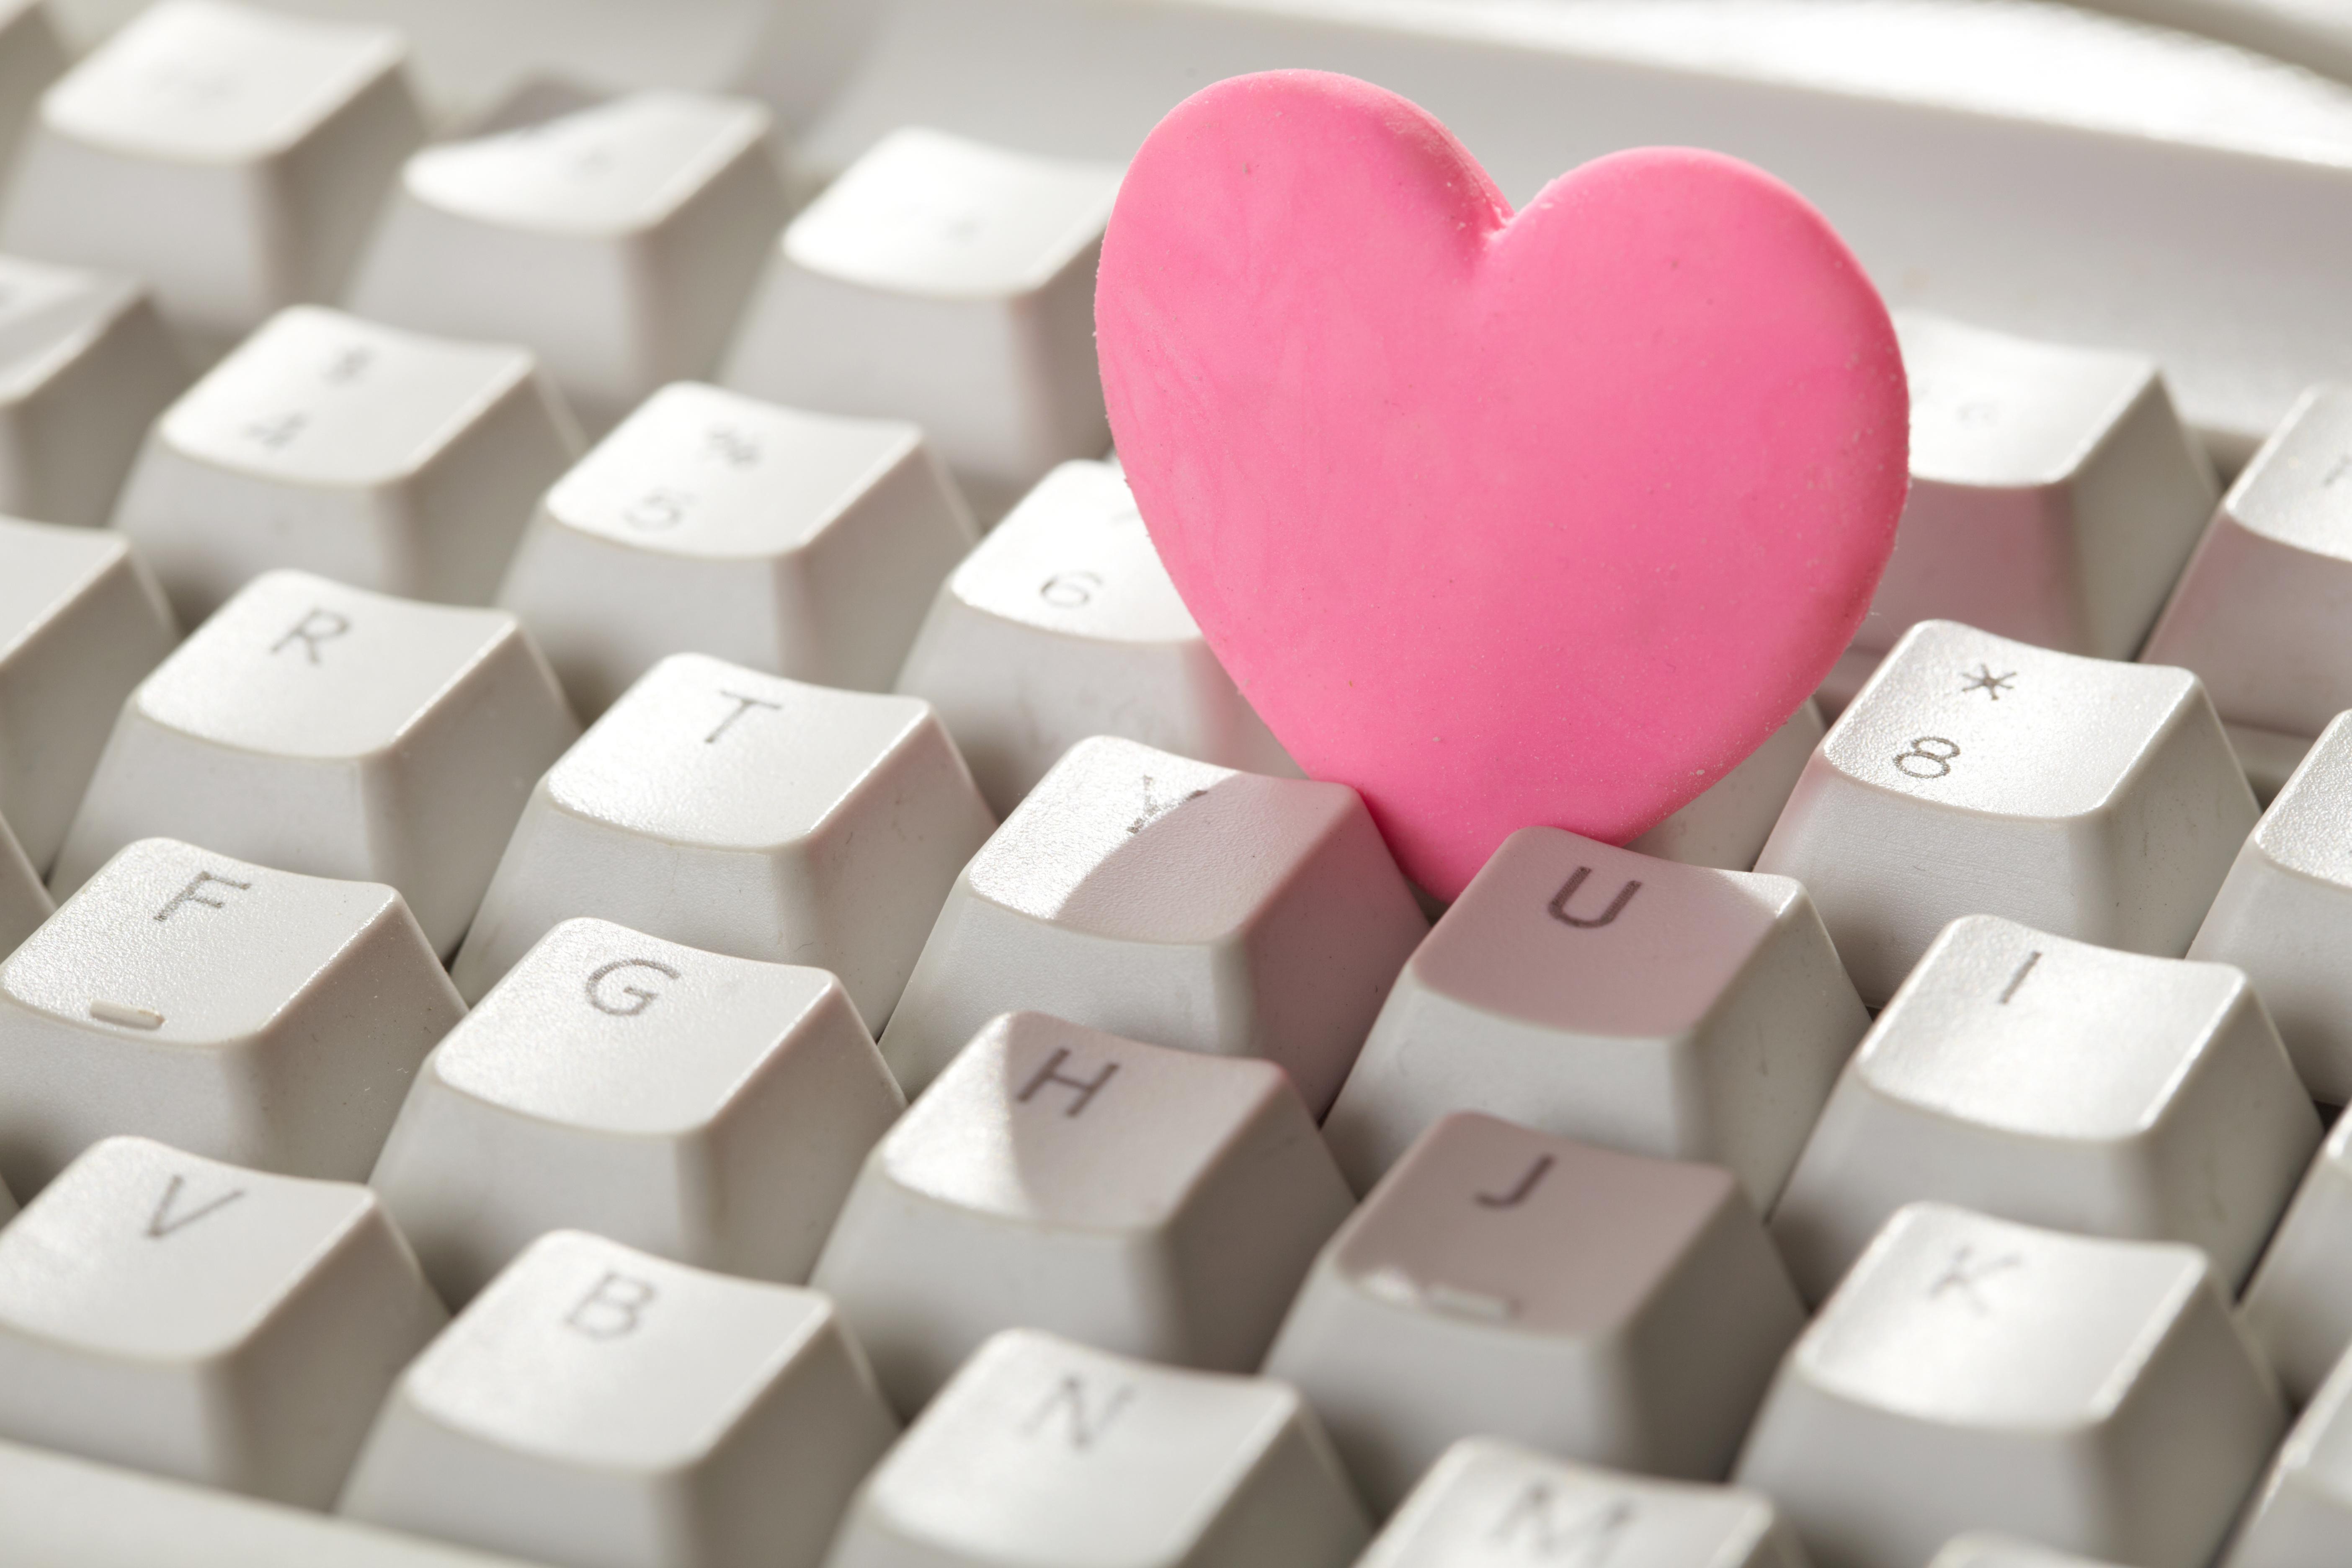 Dating femei Blida. Platirea site- ului de dating in Belgia